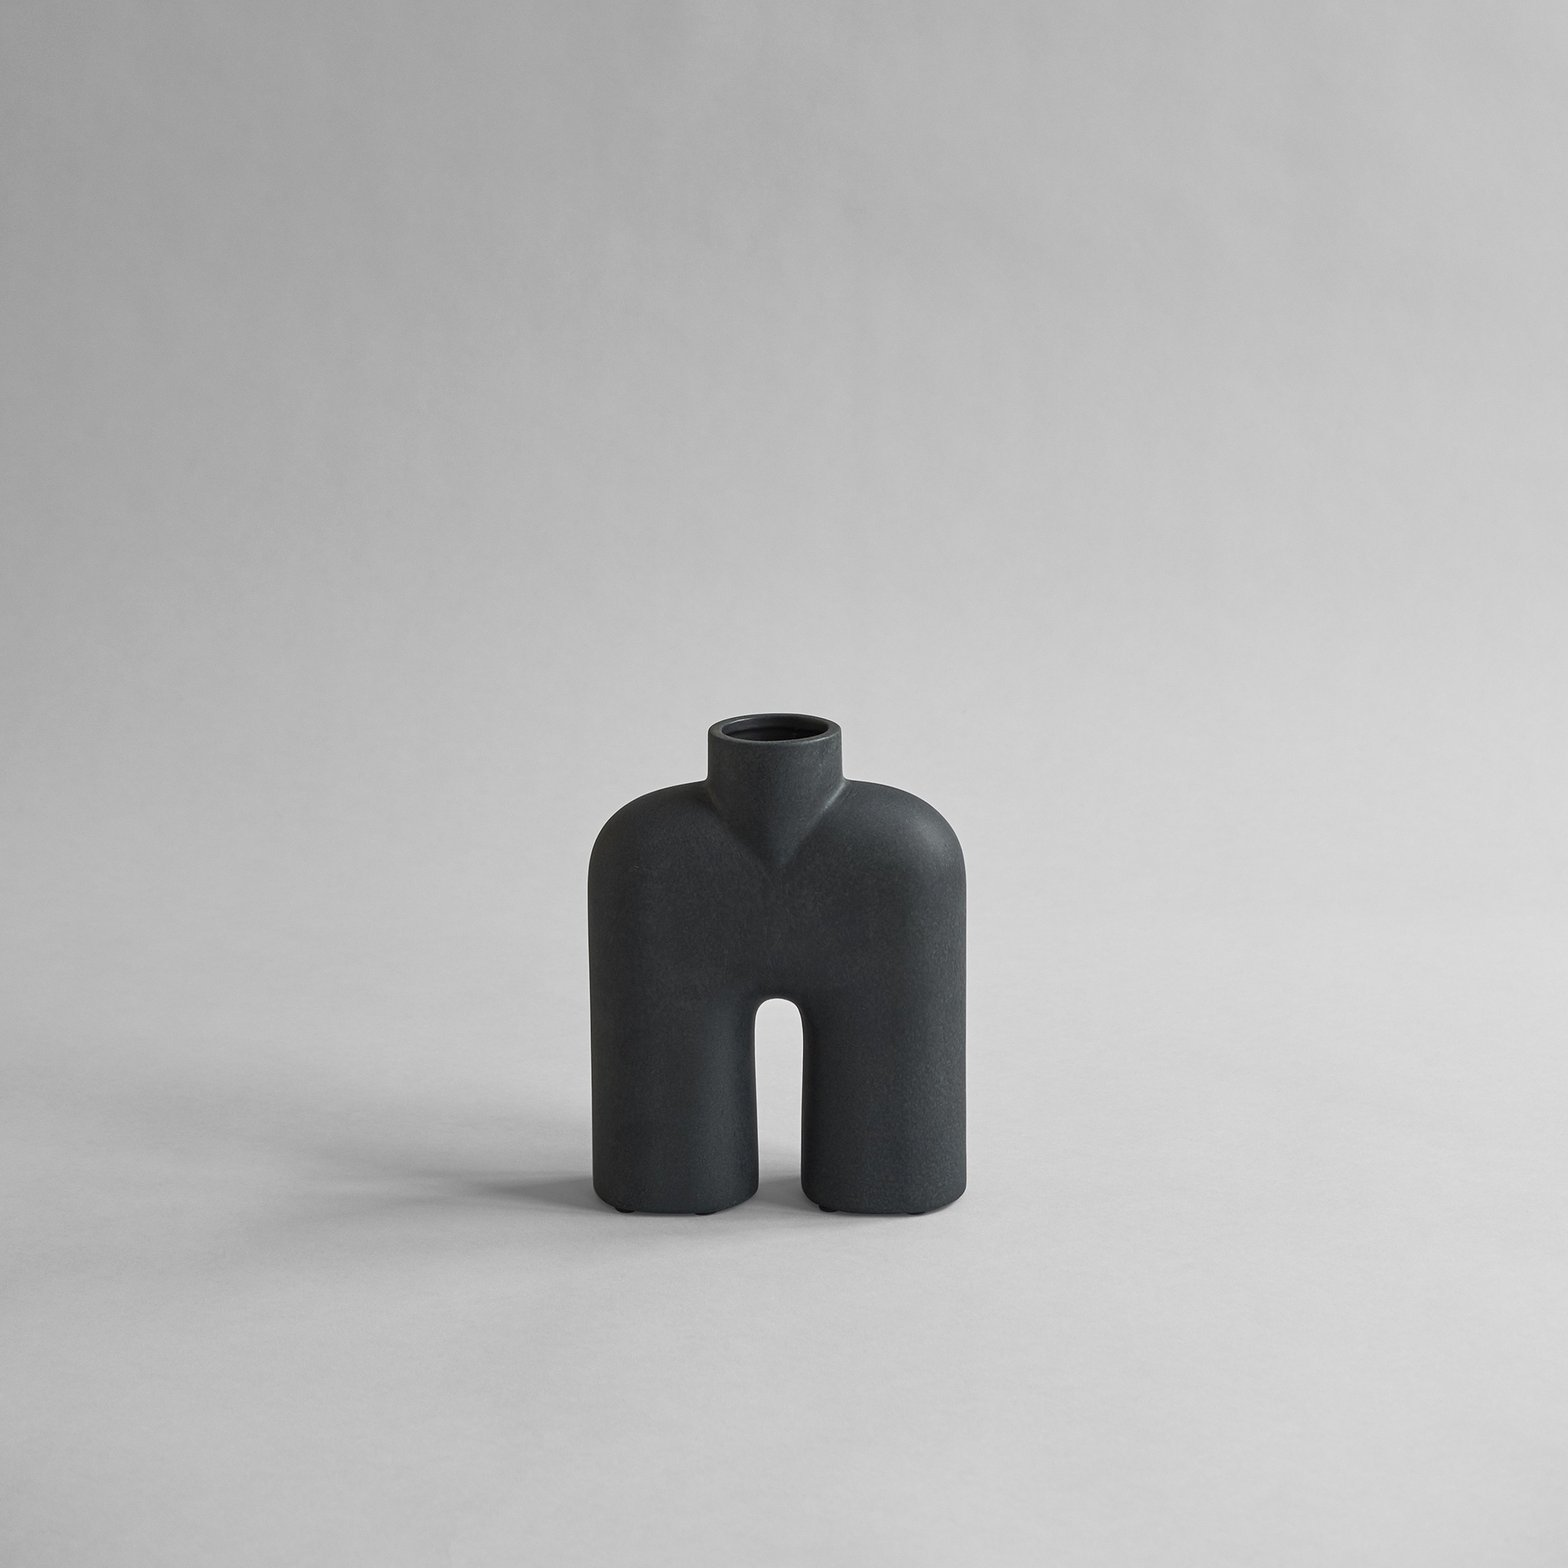 Object Cobra tall black   Design Studio Anneke Crauwels   Interieur   Mechelen